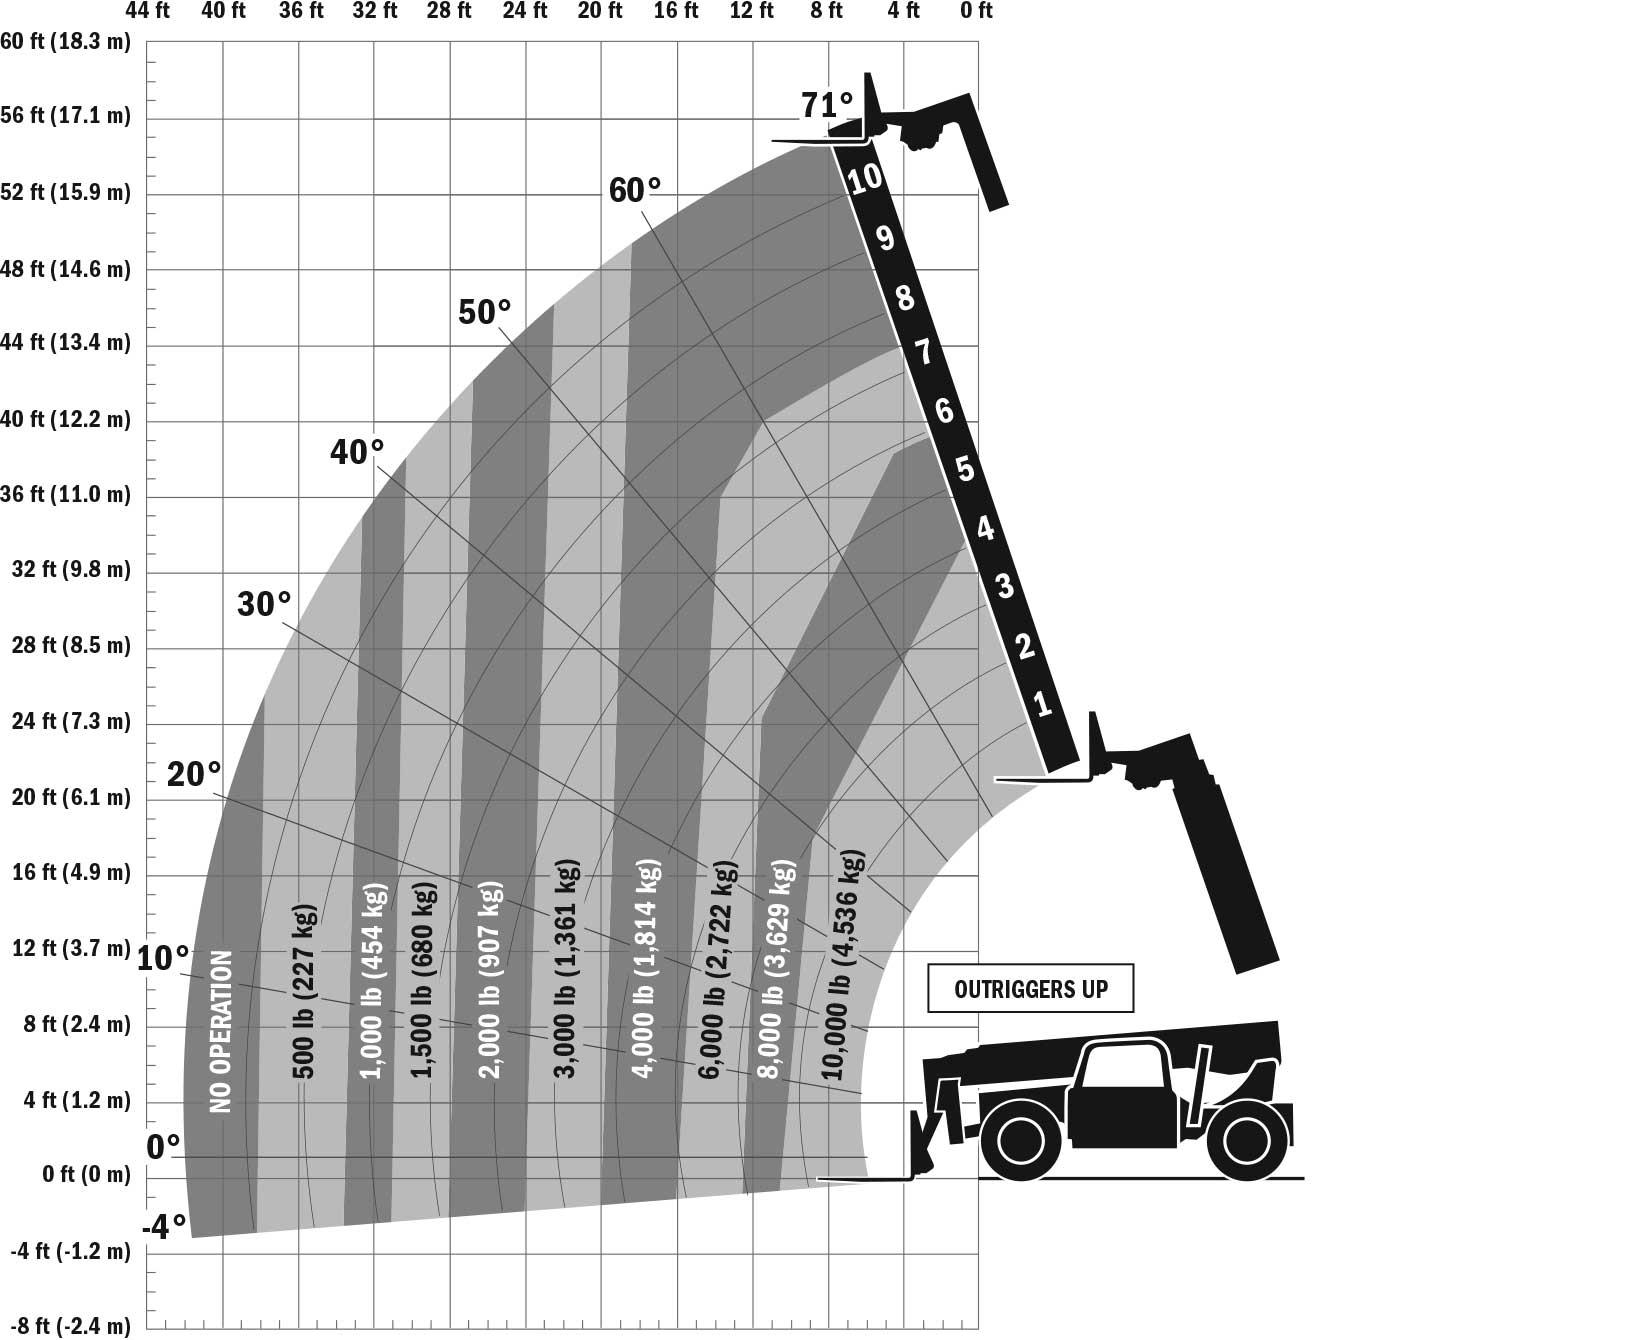 G1055AUpLoadChart  Construction Equipment  Supply